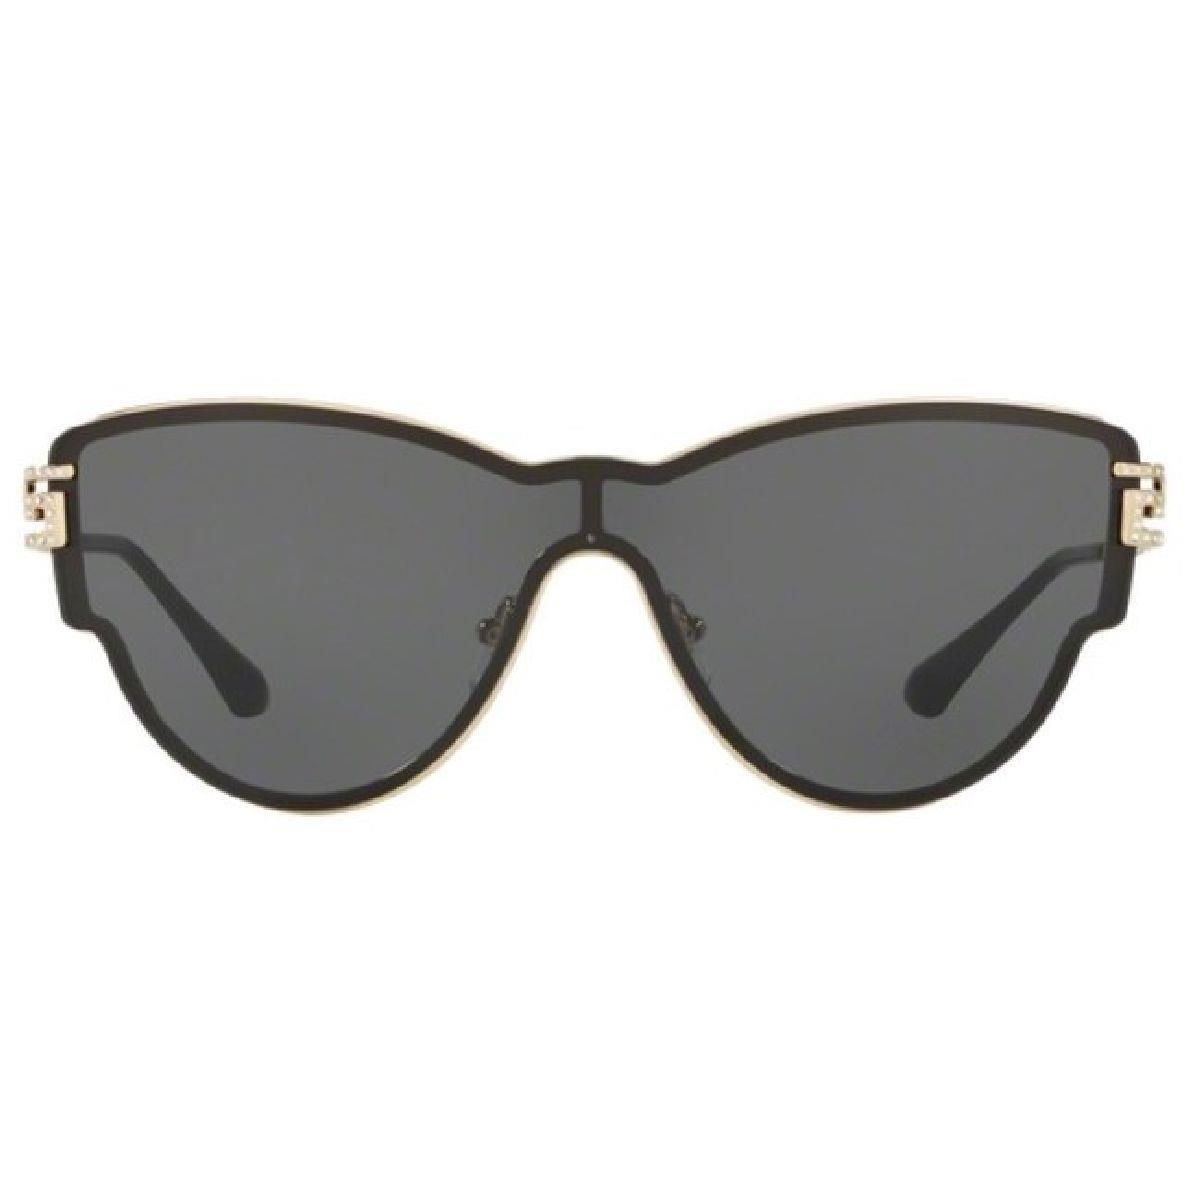 Óculos de Sol Feminino Versace - VE2172B.12528742 - VE2172B.12528742 -  VERSACE c8c2290432